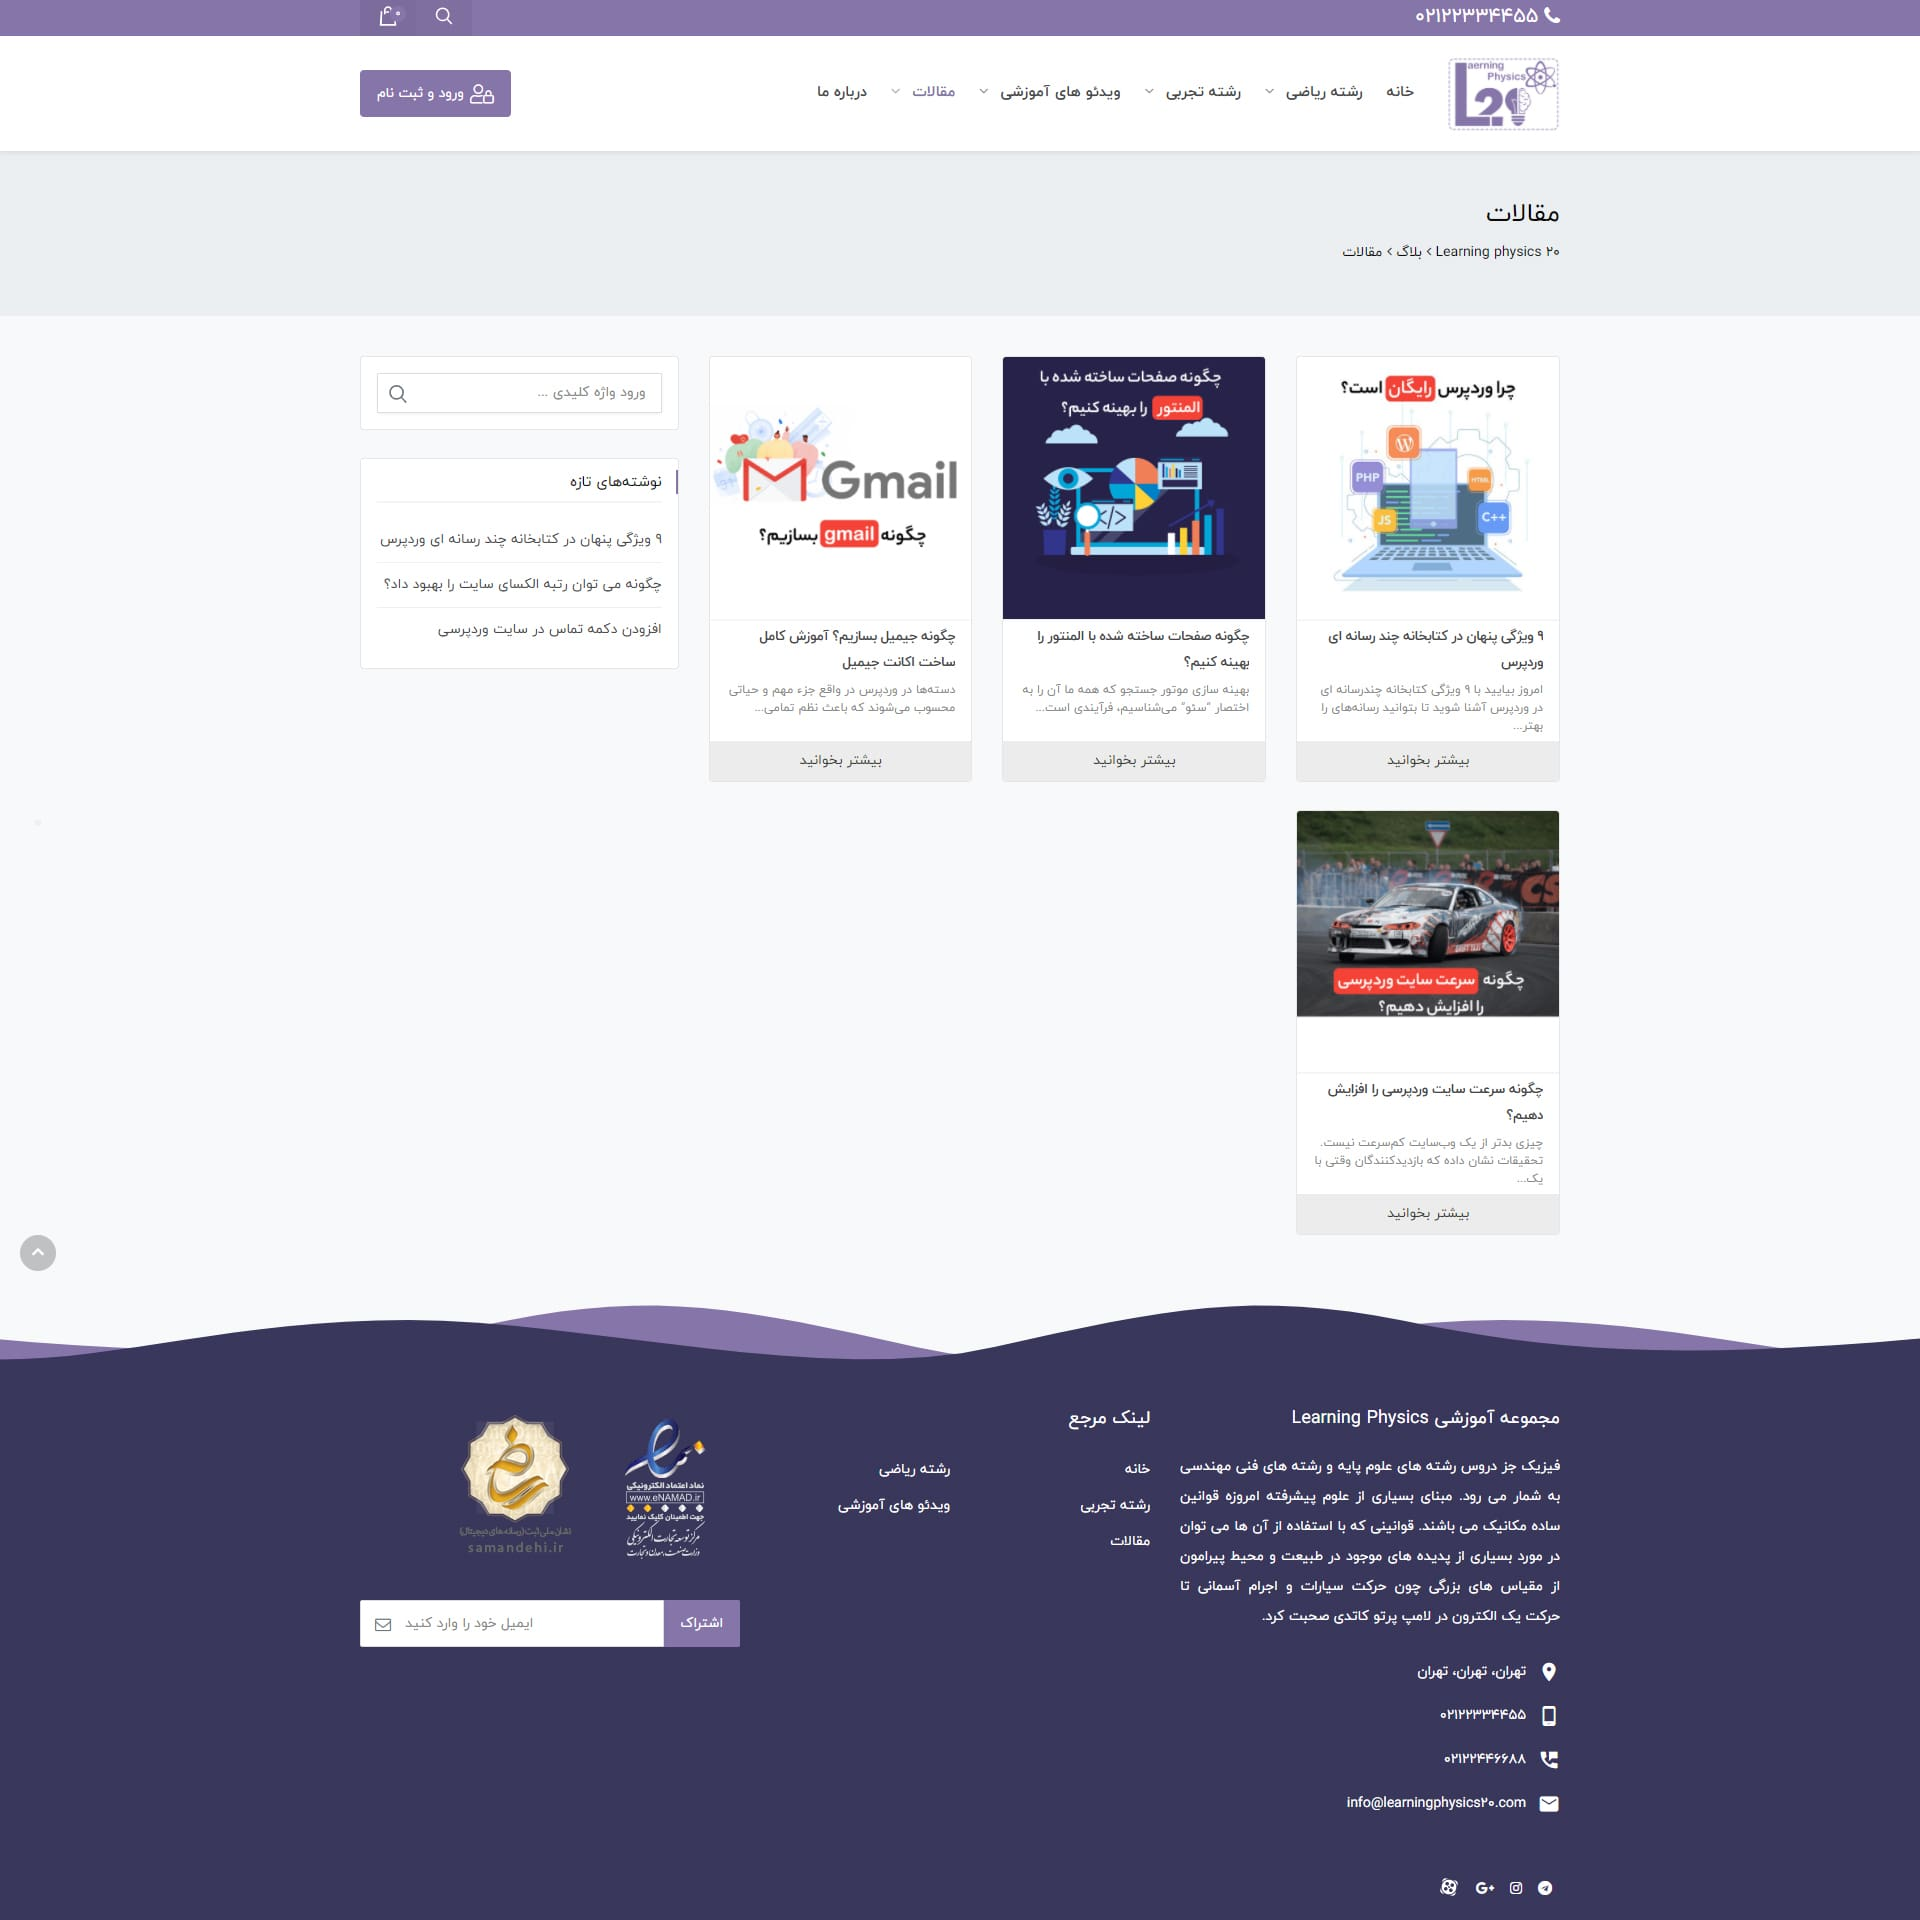 سایت آموزشی Learning Physics